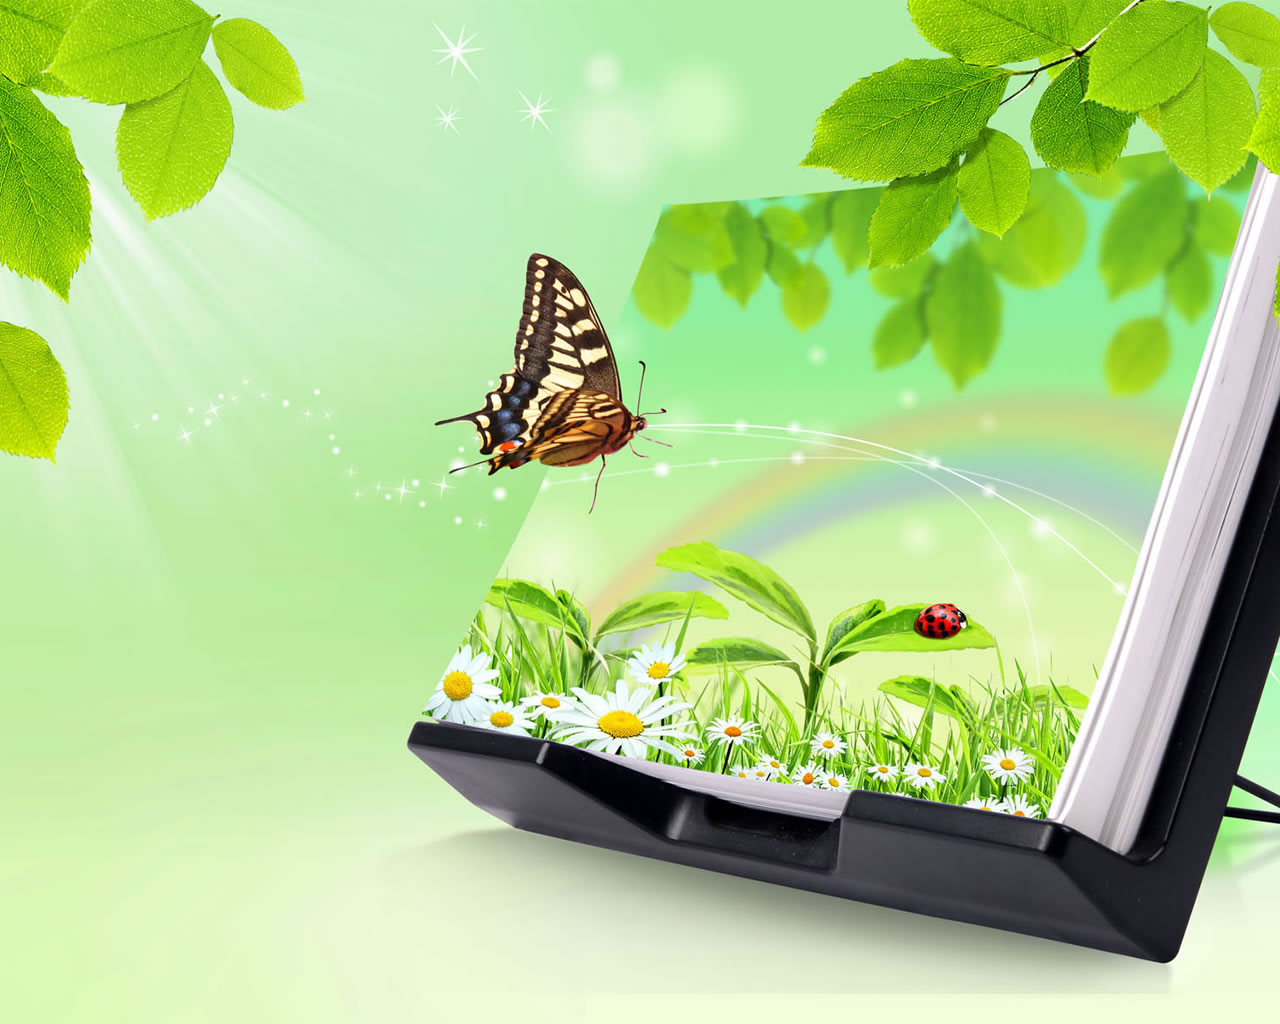 3d Wallpaper For Mobile: 3d Nature Backgrounds